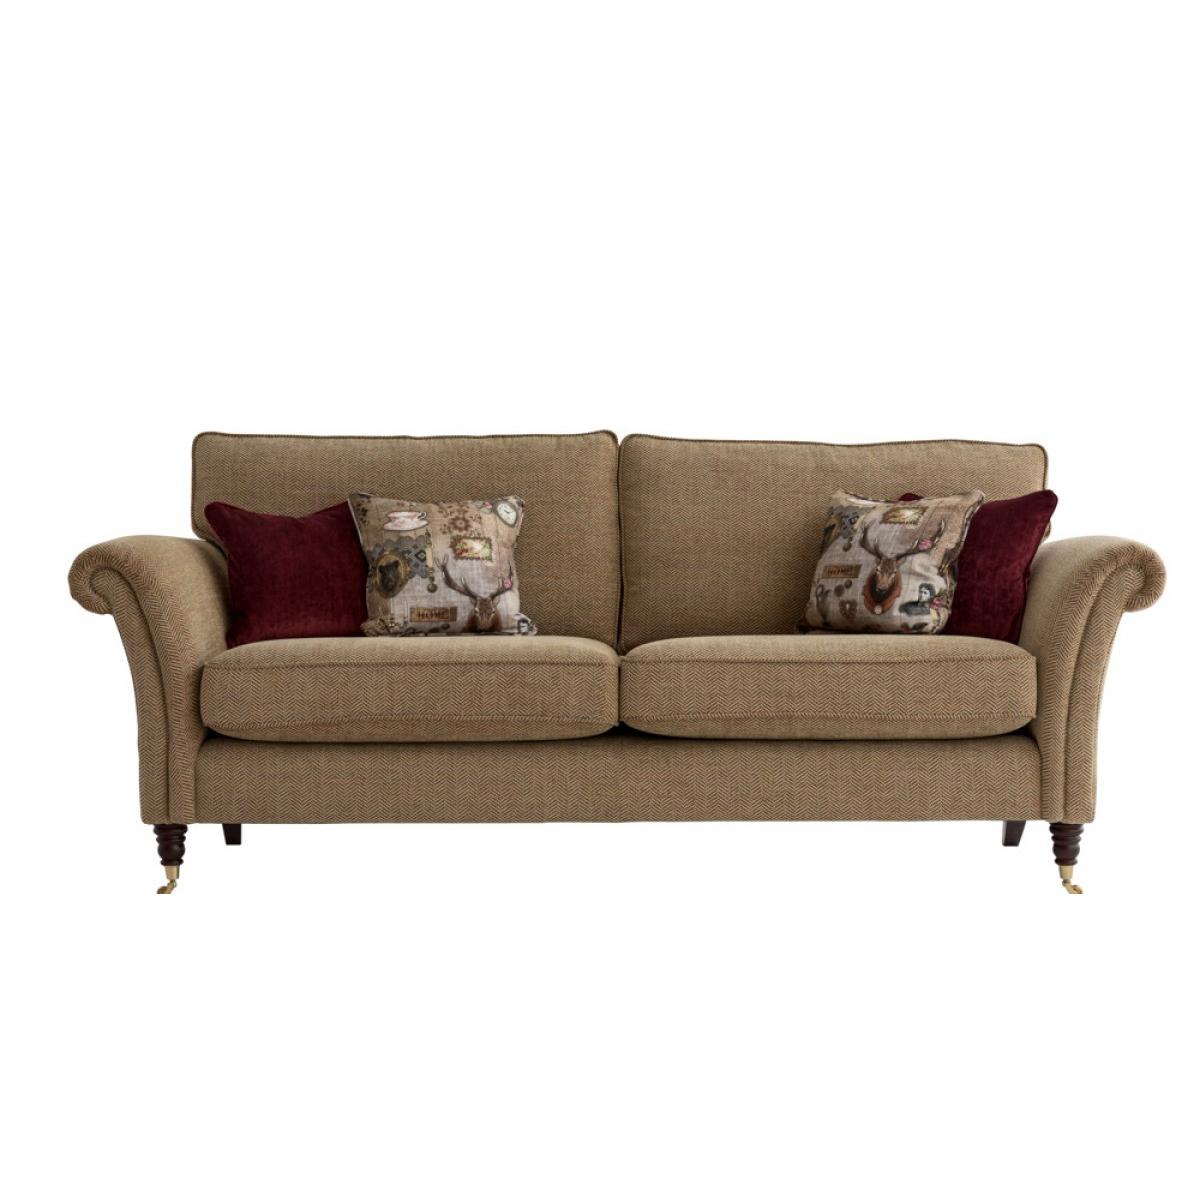 Crispin Extra Large Sofa